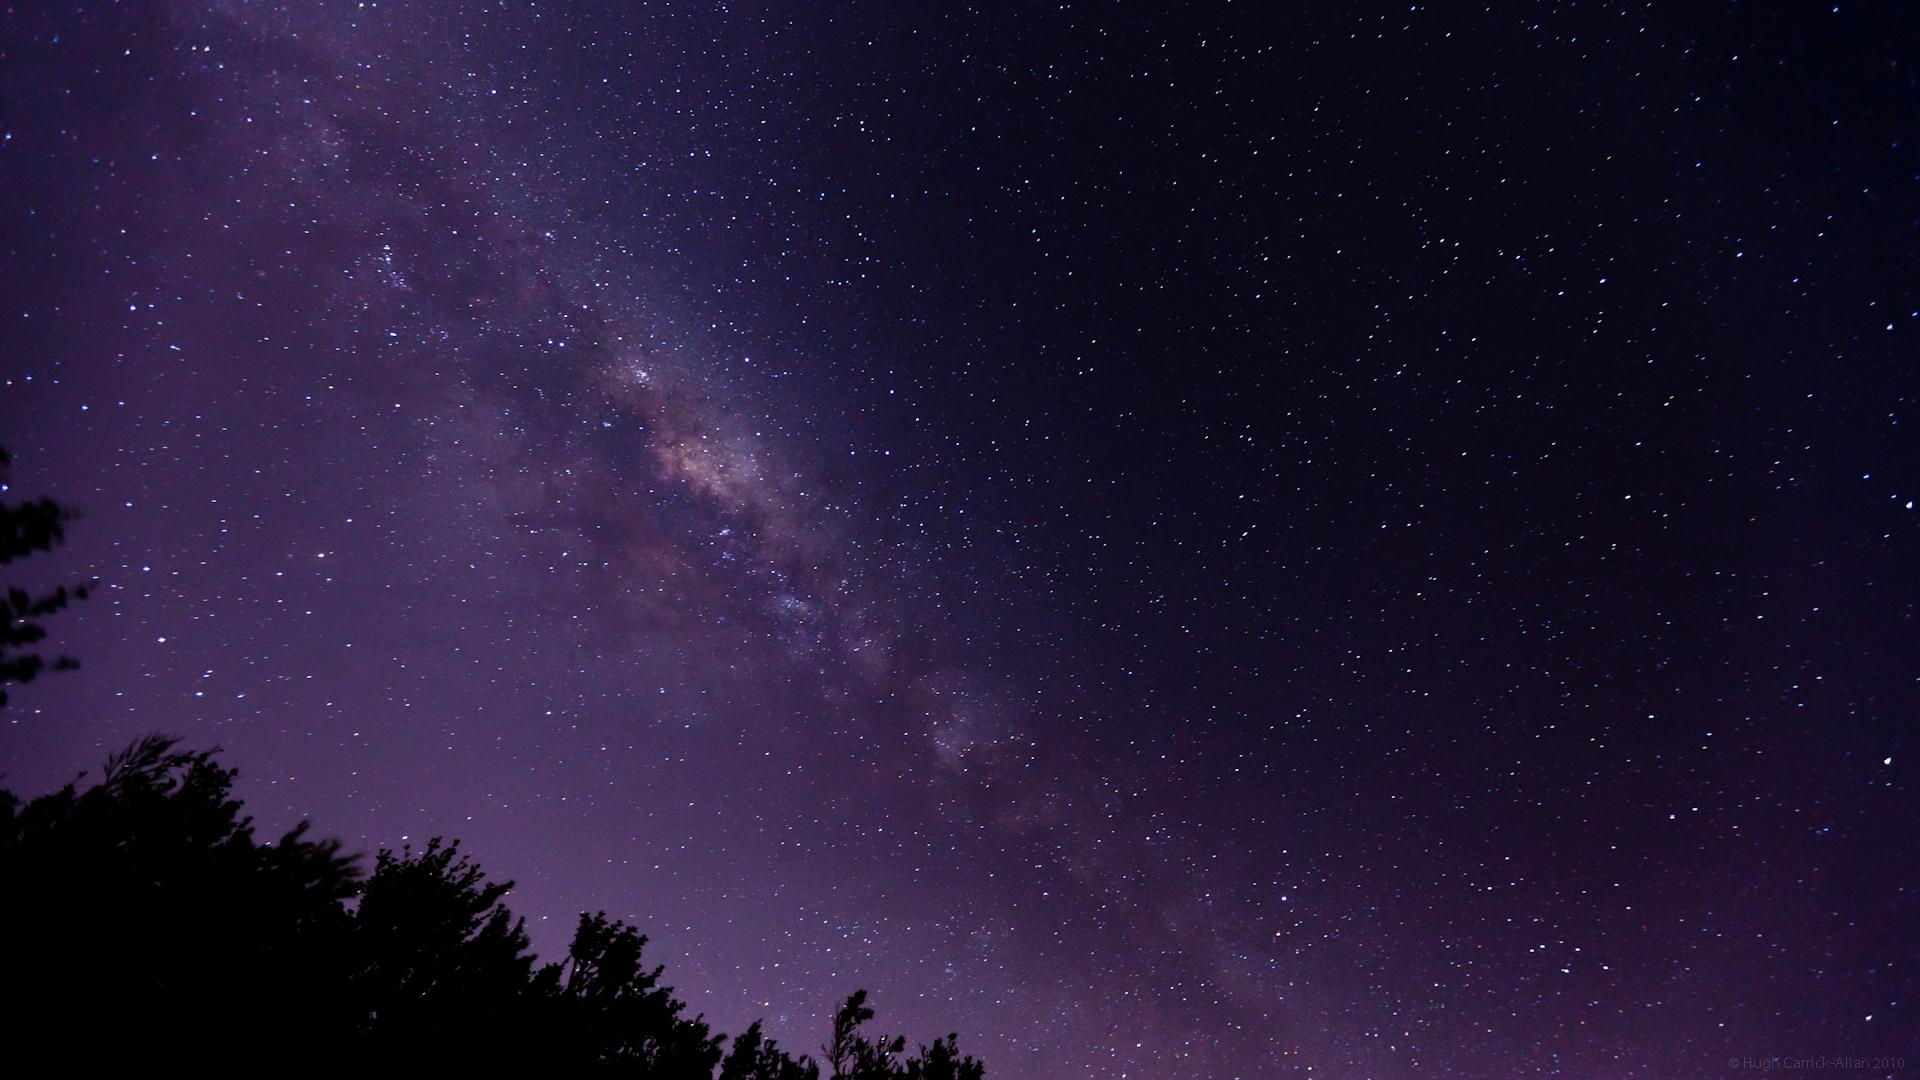 milky way galaxy edge on view - photo #41